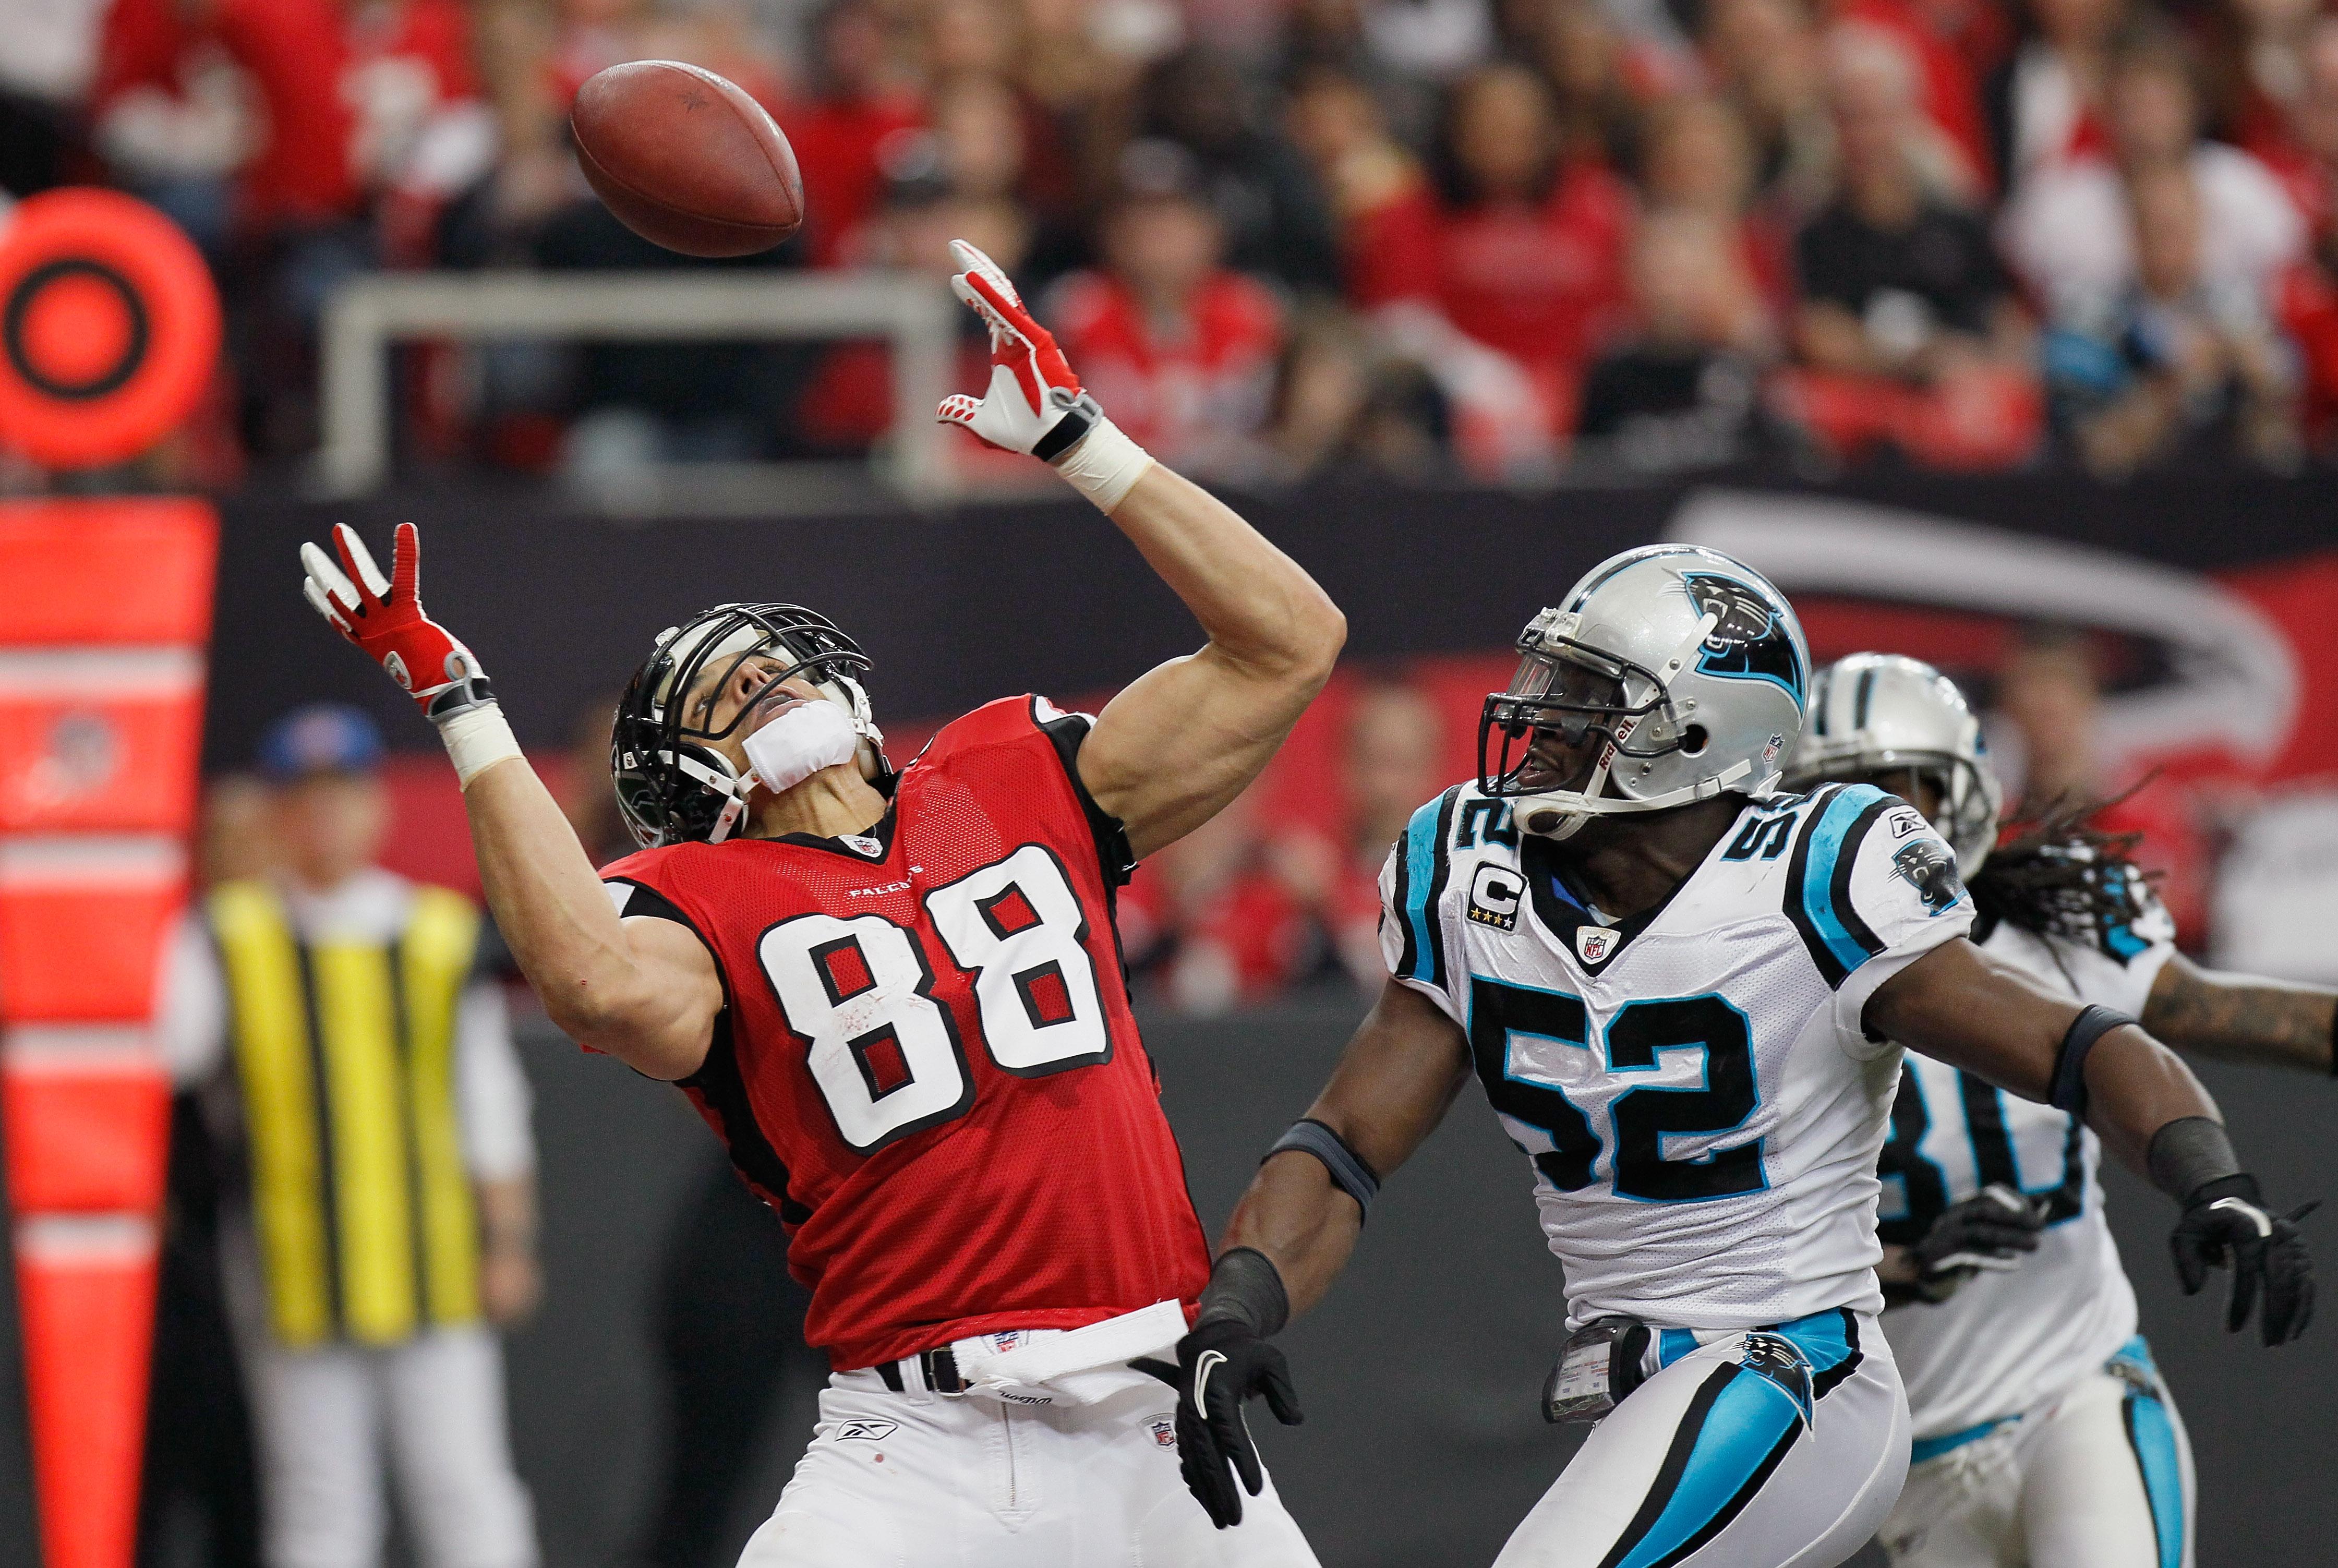 ATLANTA, GA - JANUARY 02:  Tony Gonzalez #88 of the Atlanta Falcons has this touchdown reception broken up by Jon Beason #52 of the Carolina Panthers at Georgia Dome on January 2, 2011 in Atlanta, Georgia.  (Photo by Kevin C. Cox/Getty Images)